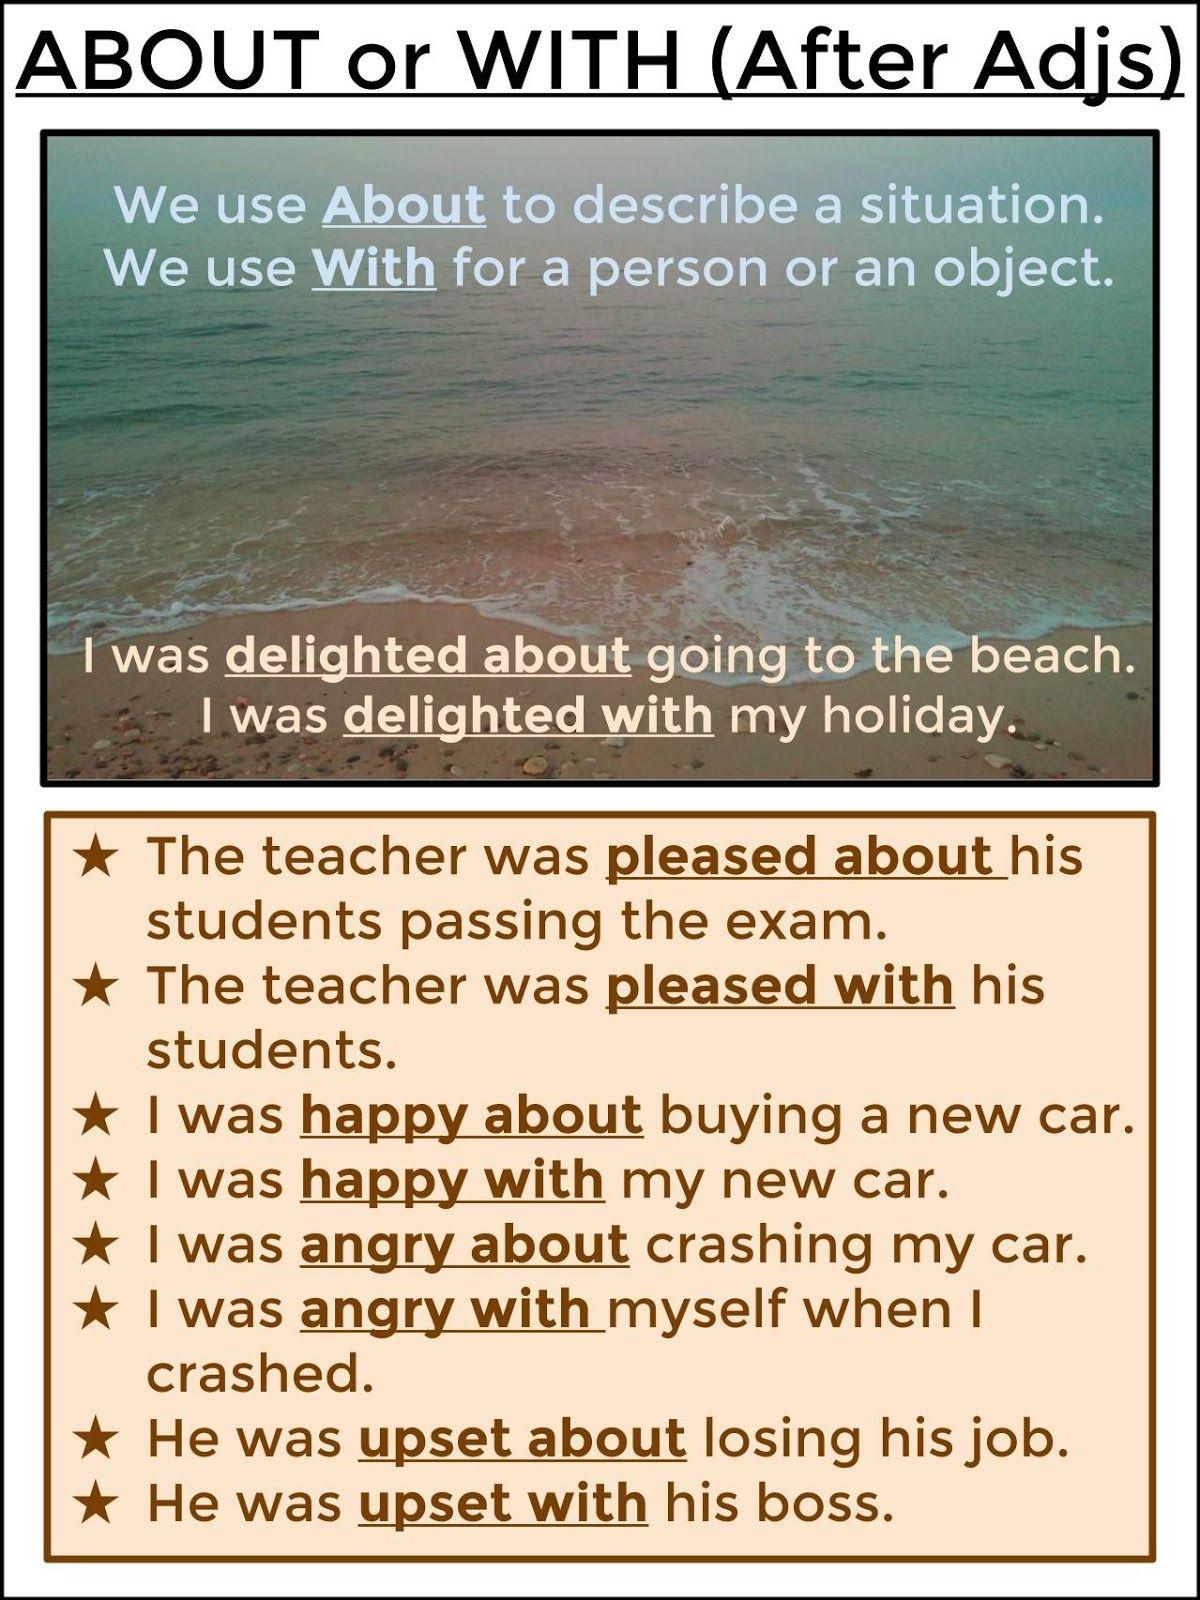 Adjectives - English Grammar Today - Cambridge Dictionary